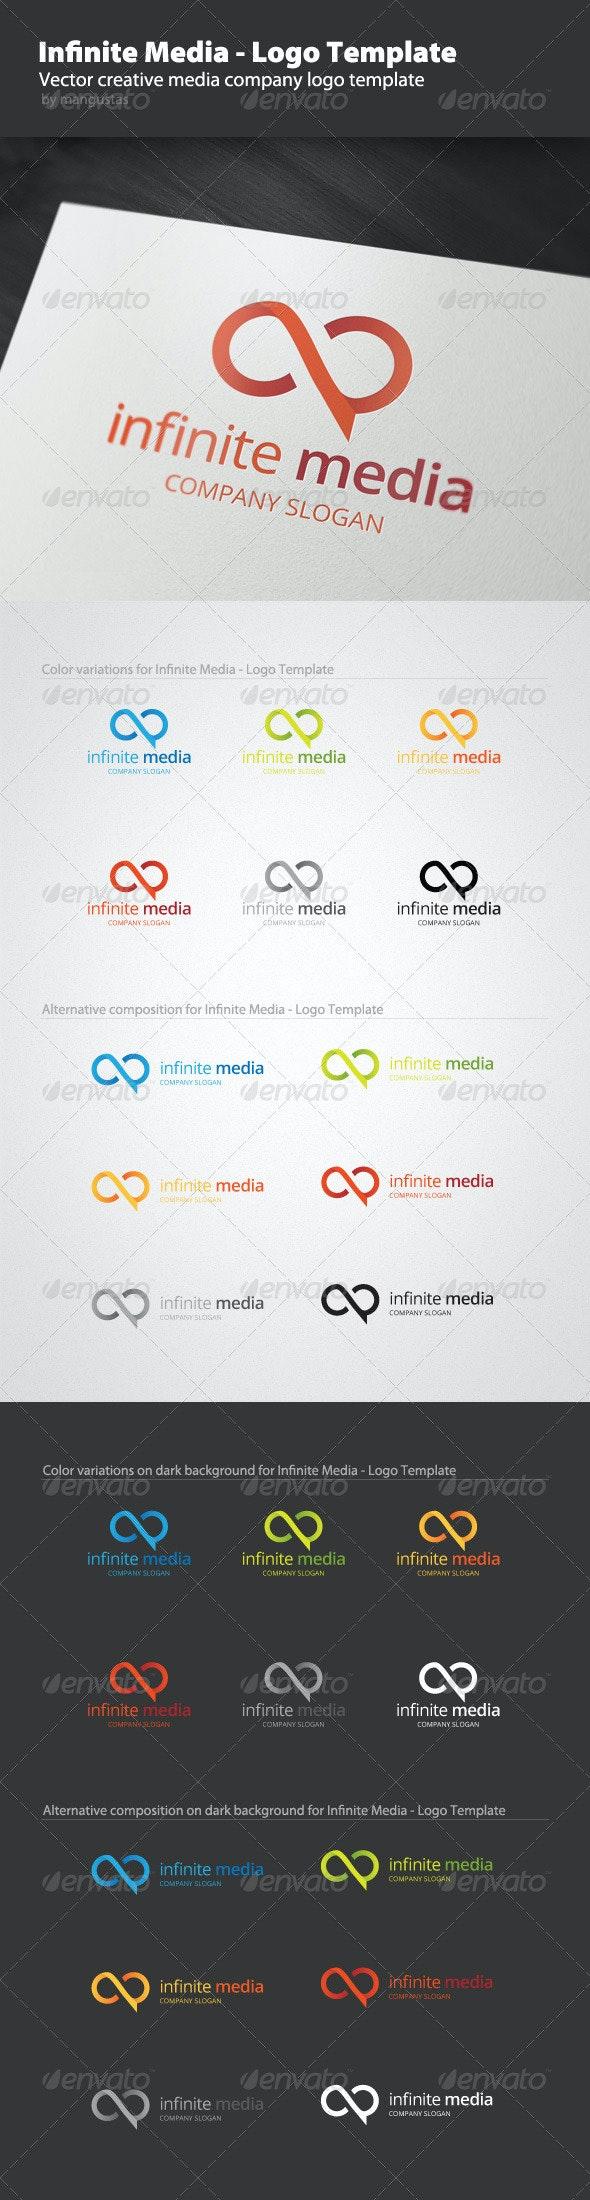 Infinite Media - Logo Template - Vector Abstract